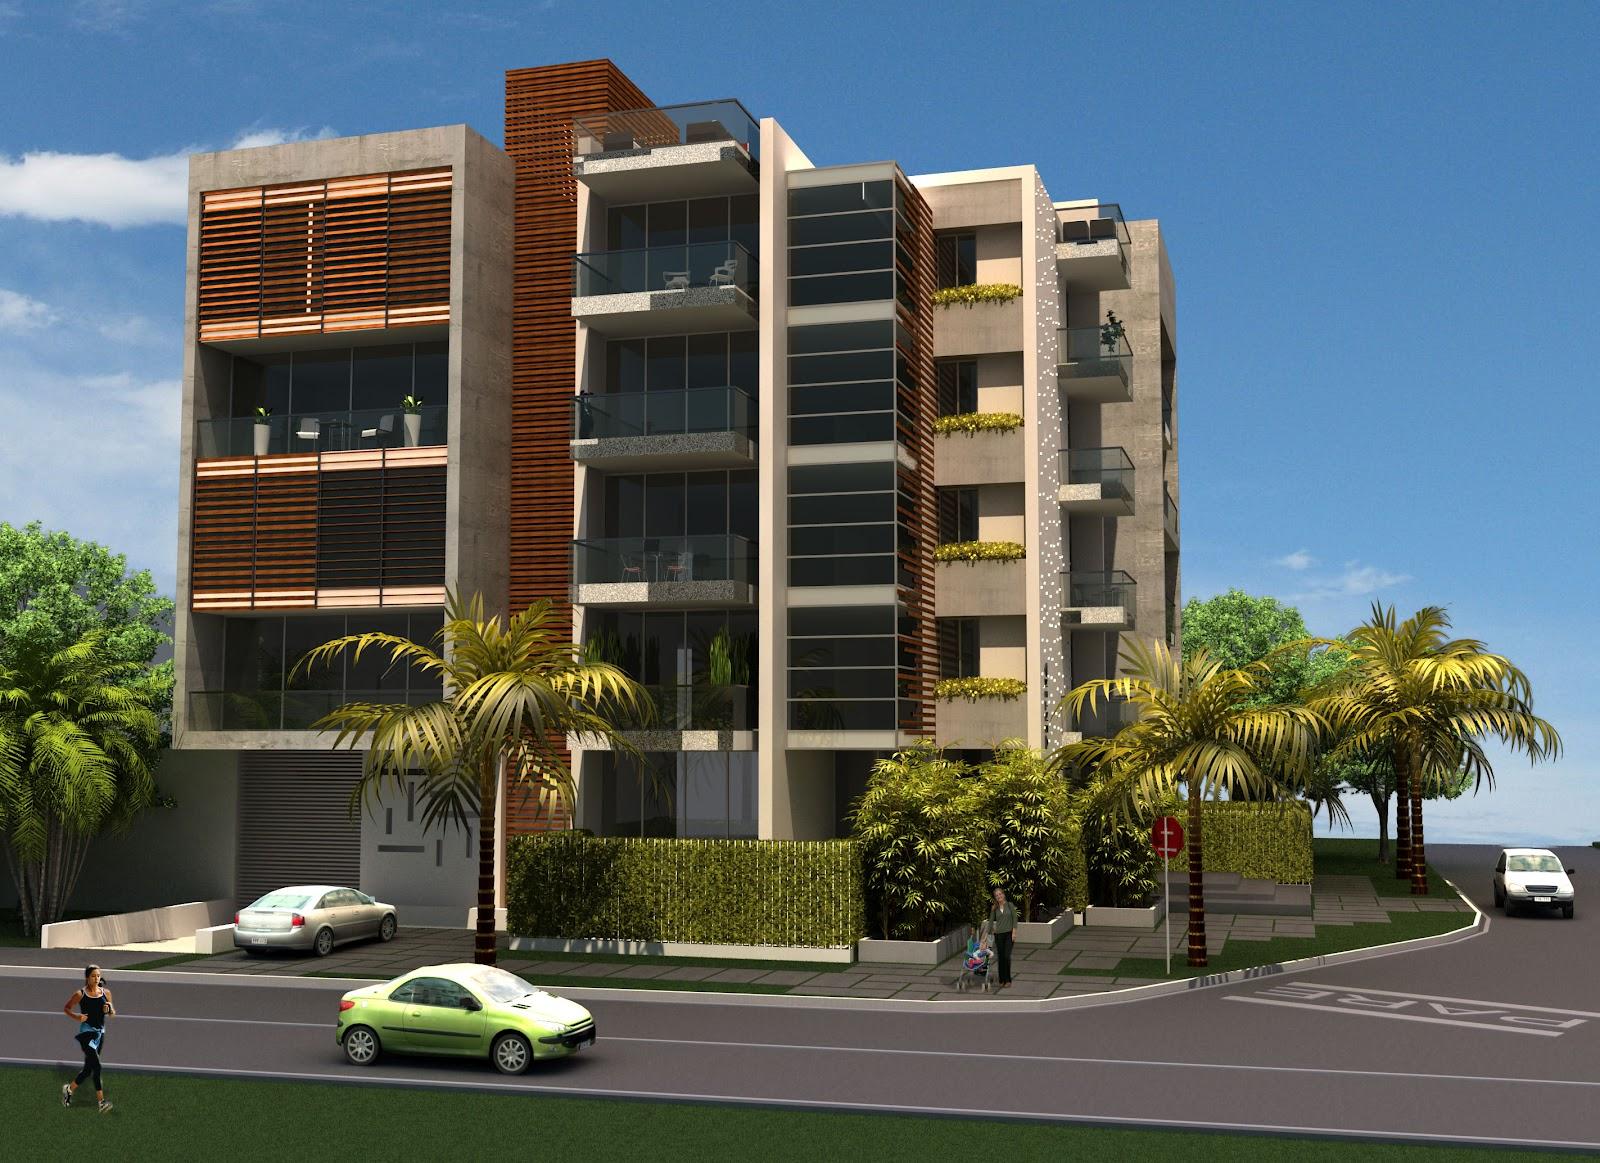 Diversificar s a constructora octubre 2012 for Diseno de apartamentos de 3 pisos